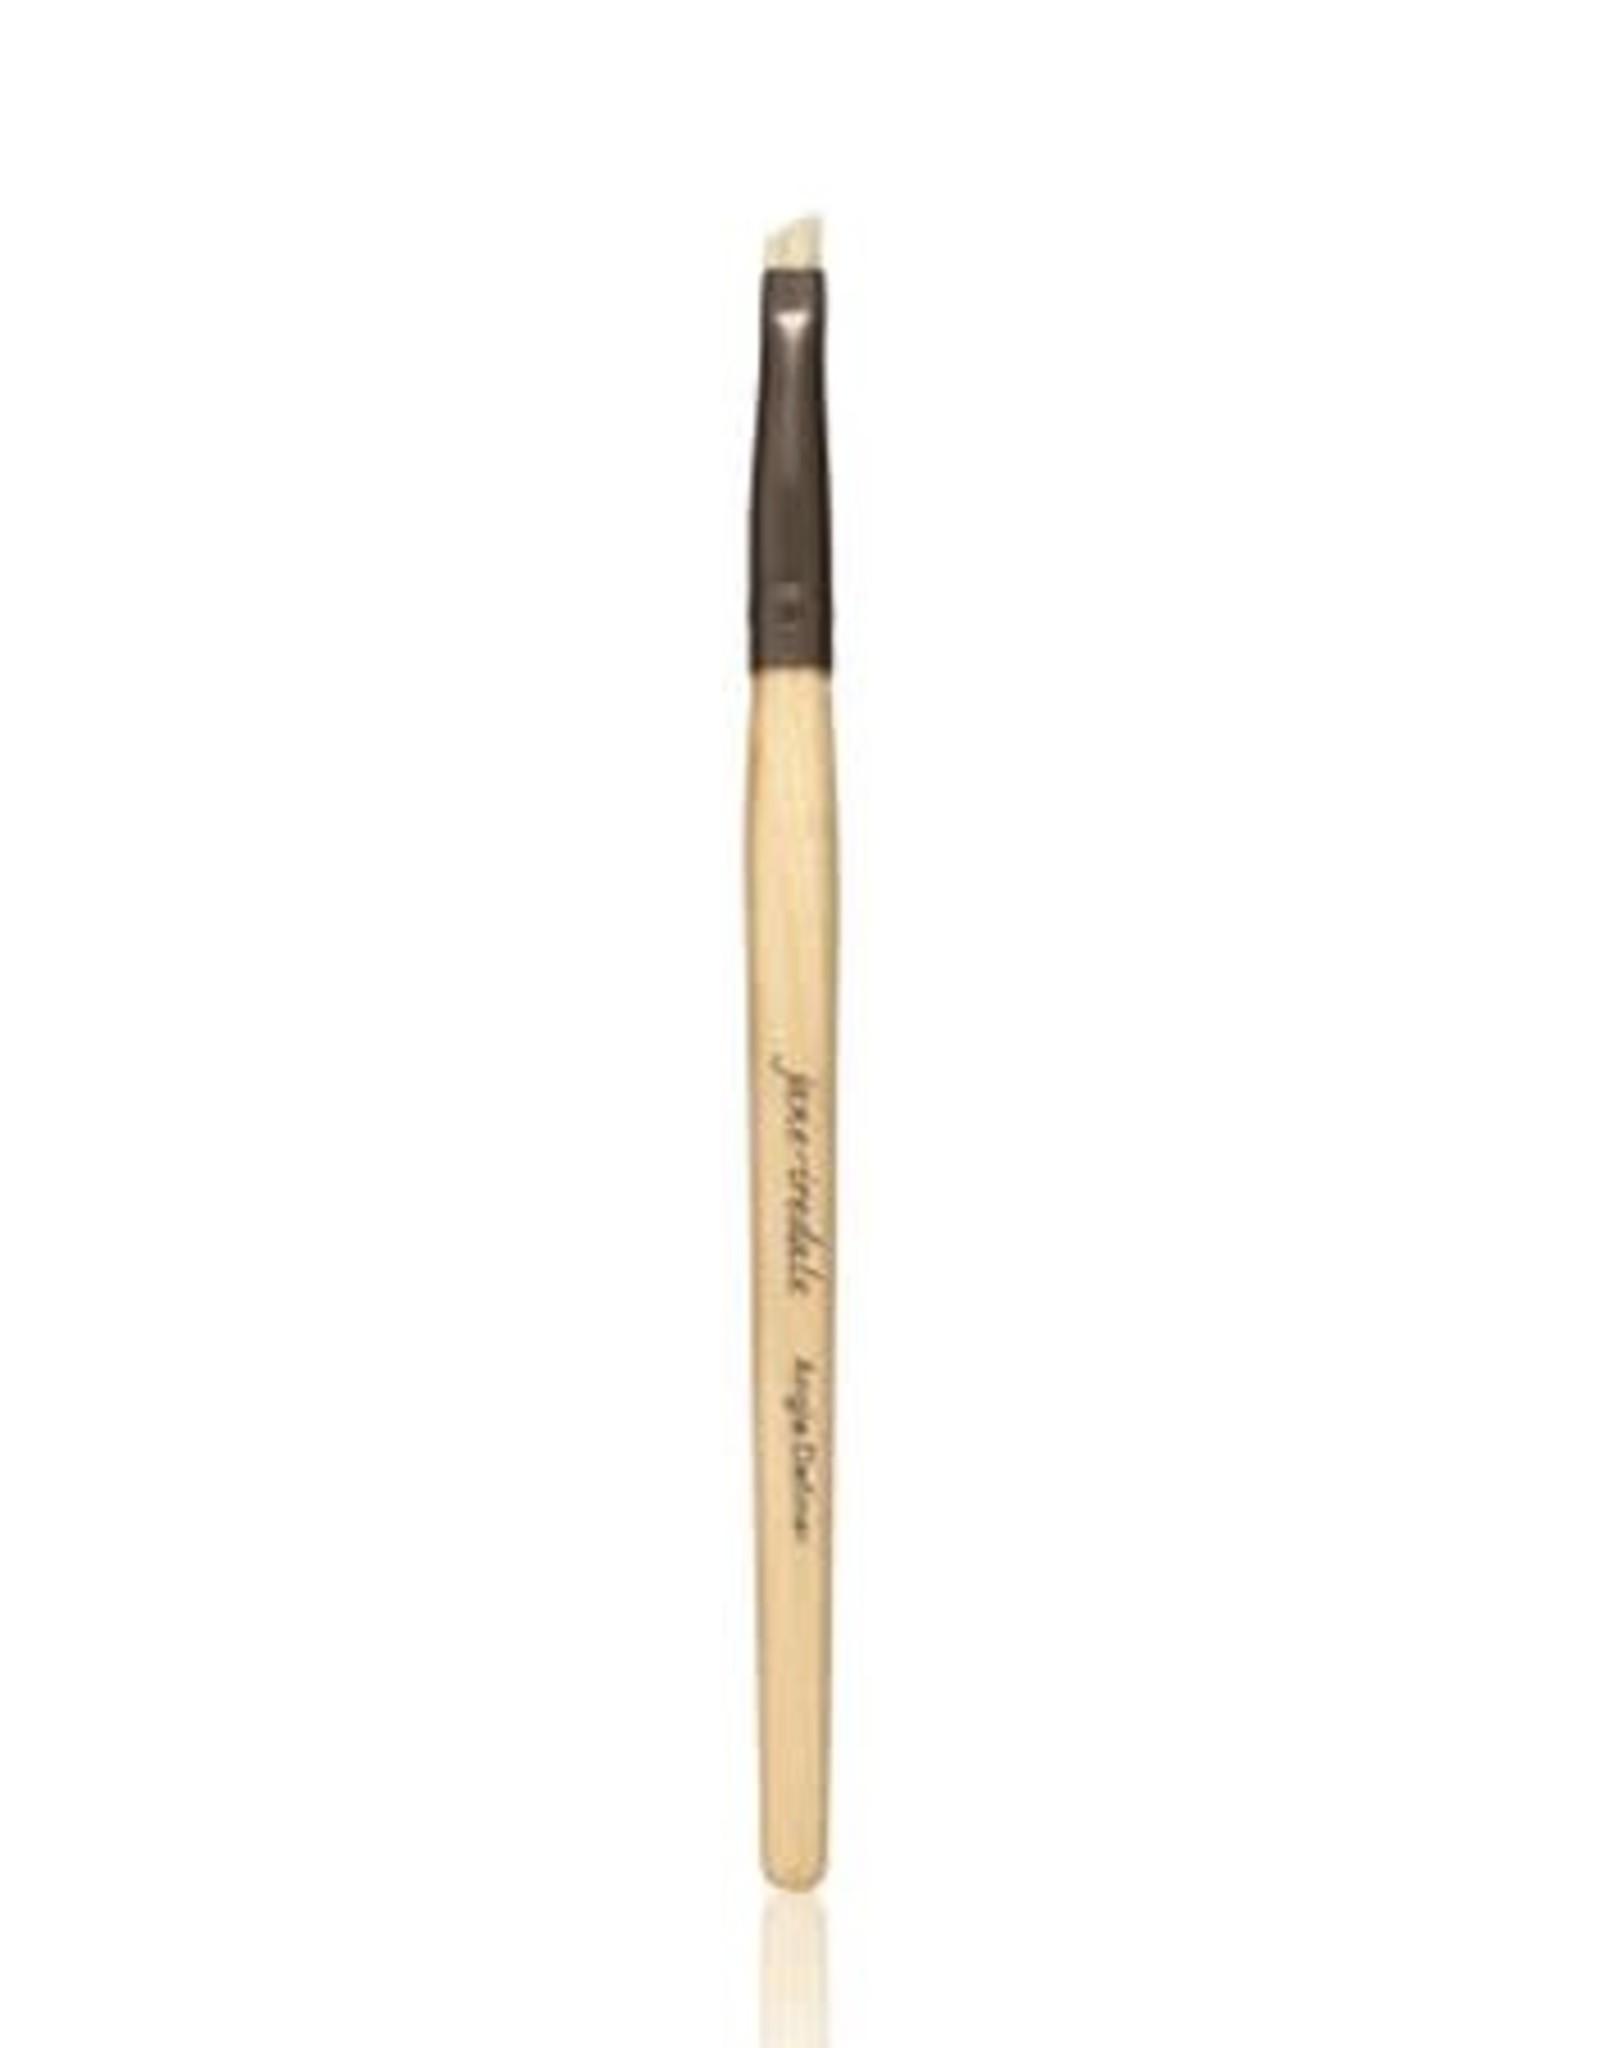 Jane Iredale Angle Definer Brush